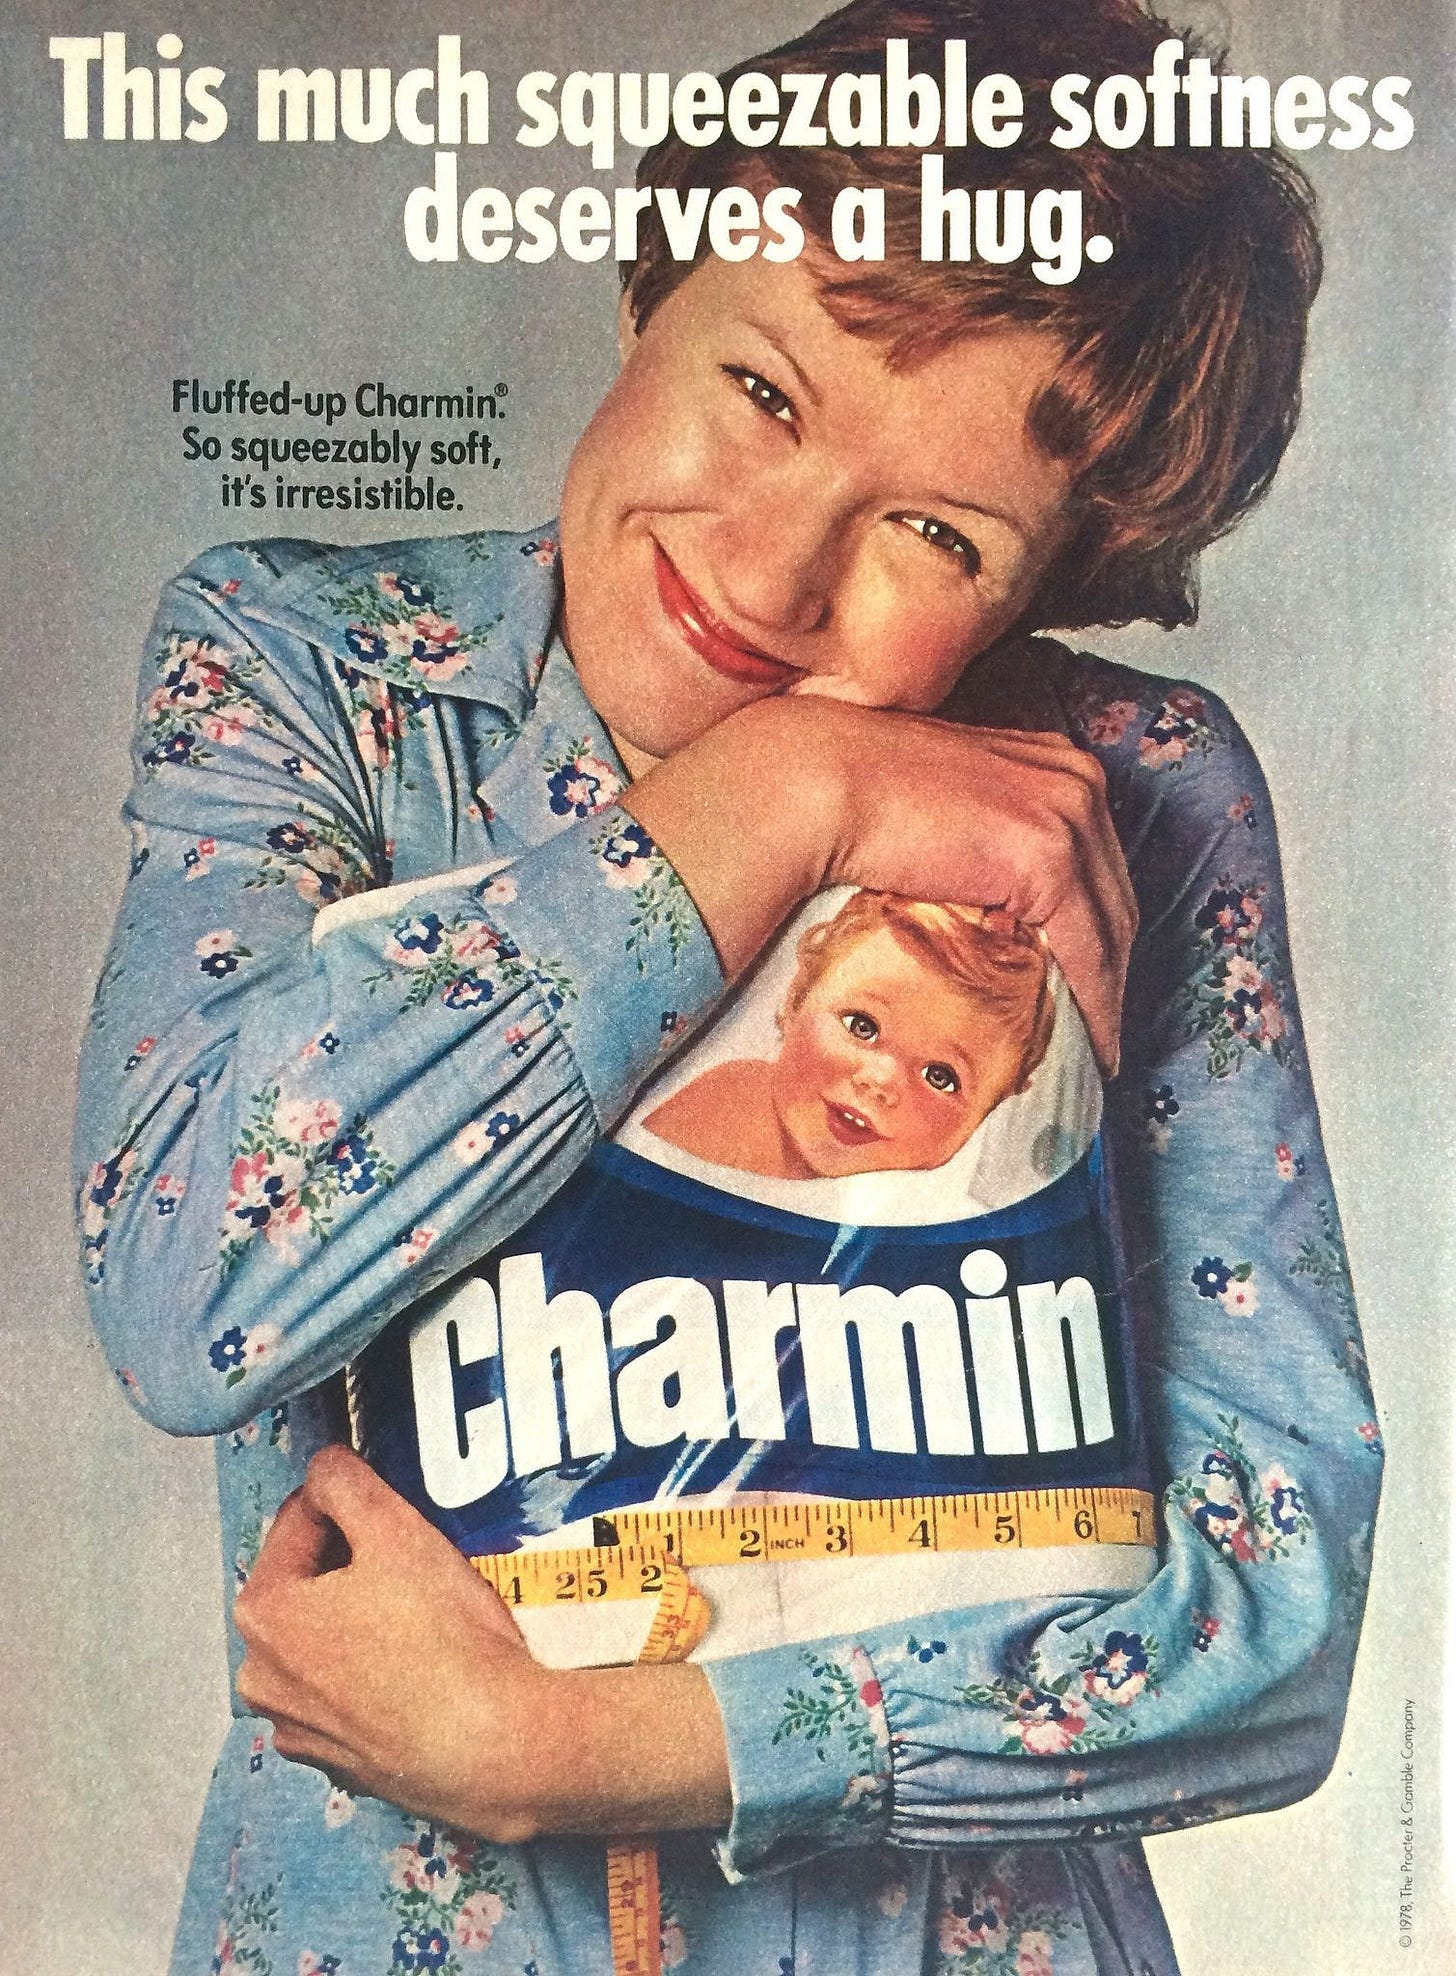 1970s: Charmin   Commercial advertisement, Vintage ads, Fun